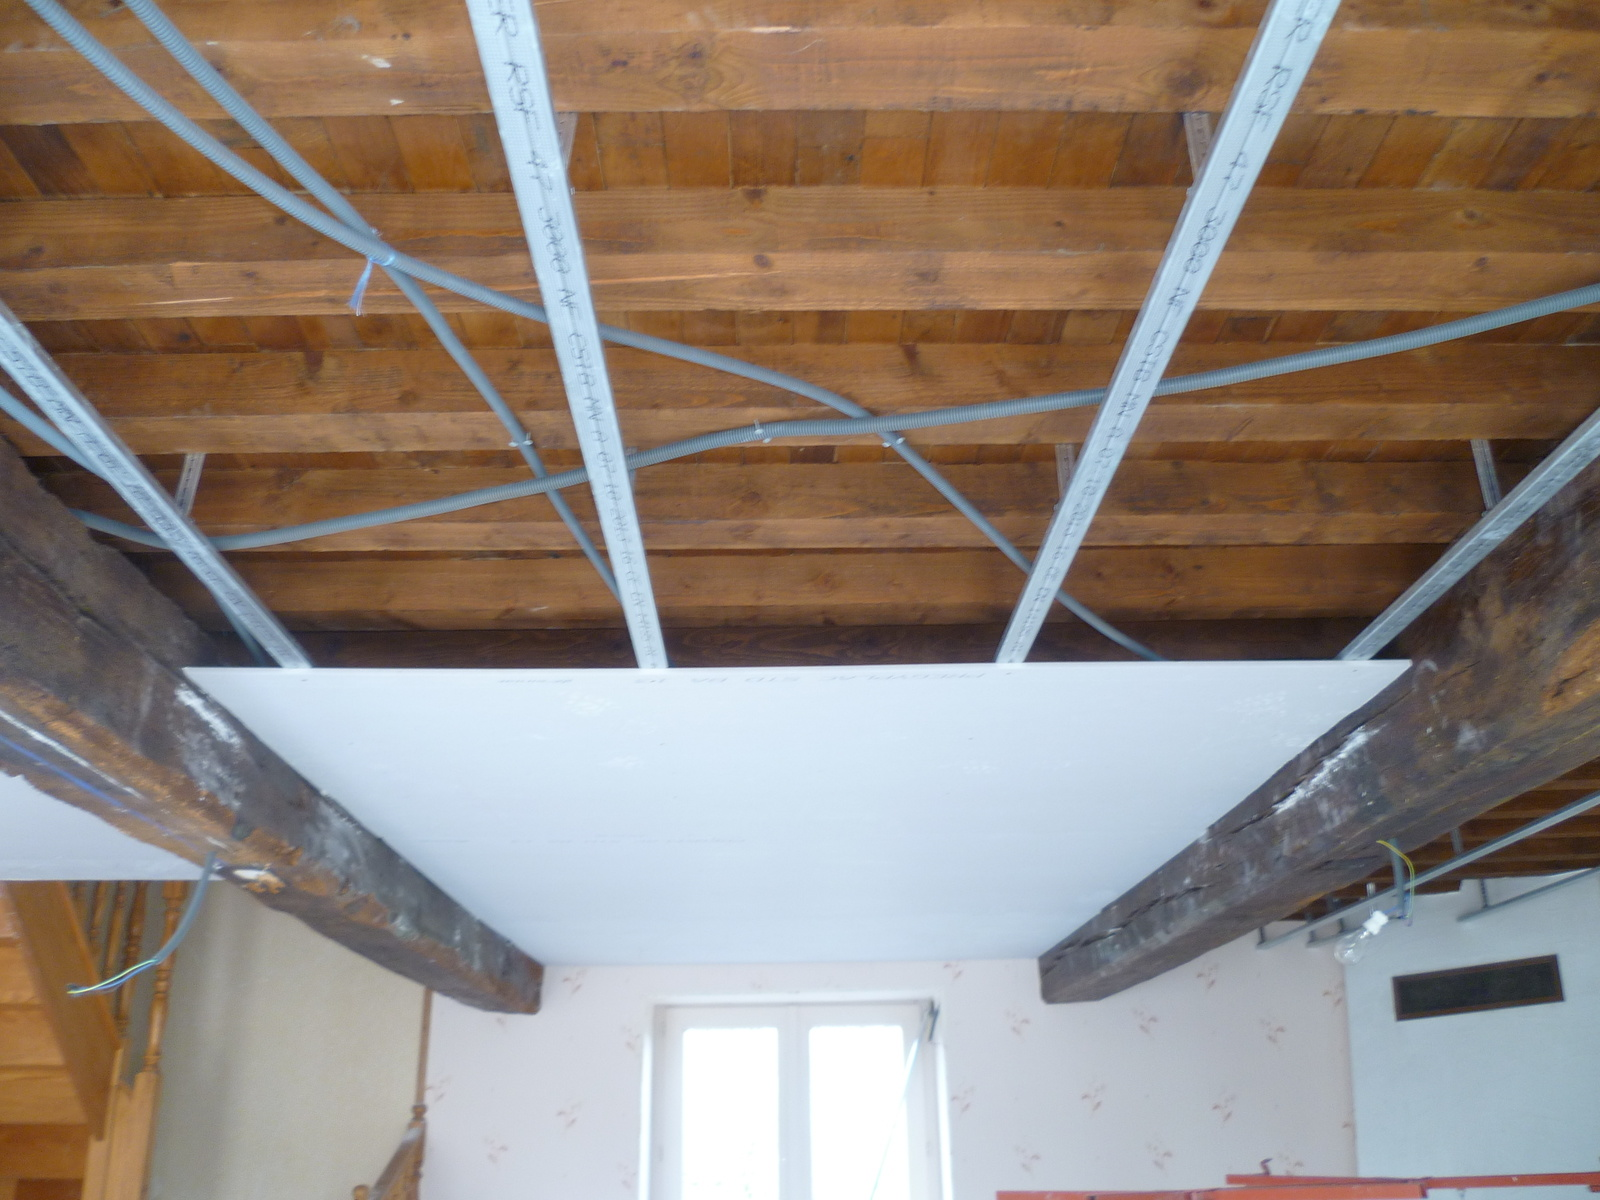 Plafond suspendu placo isolation id es - Isolation phonique plafond suspendu ...